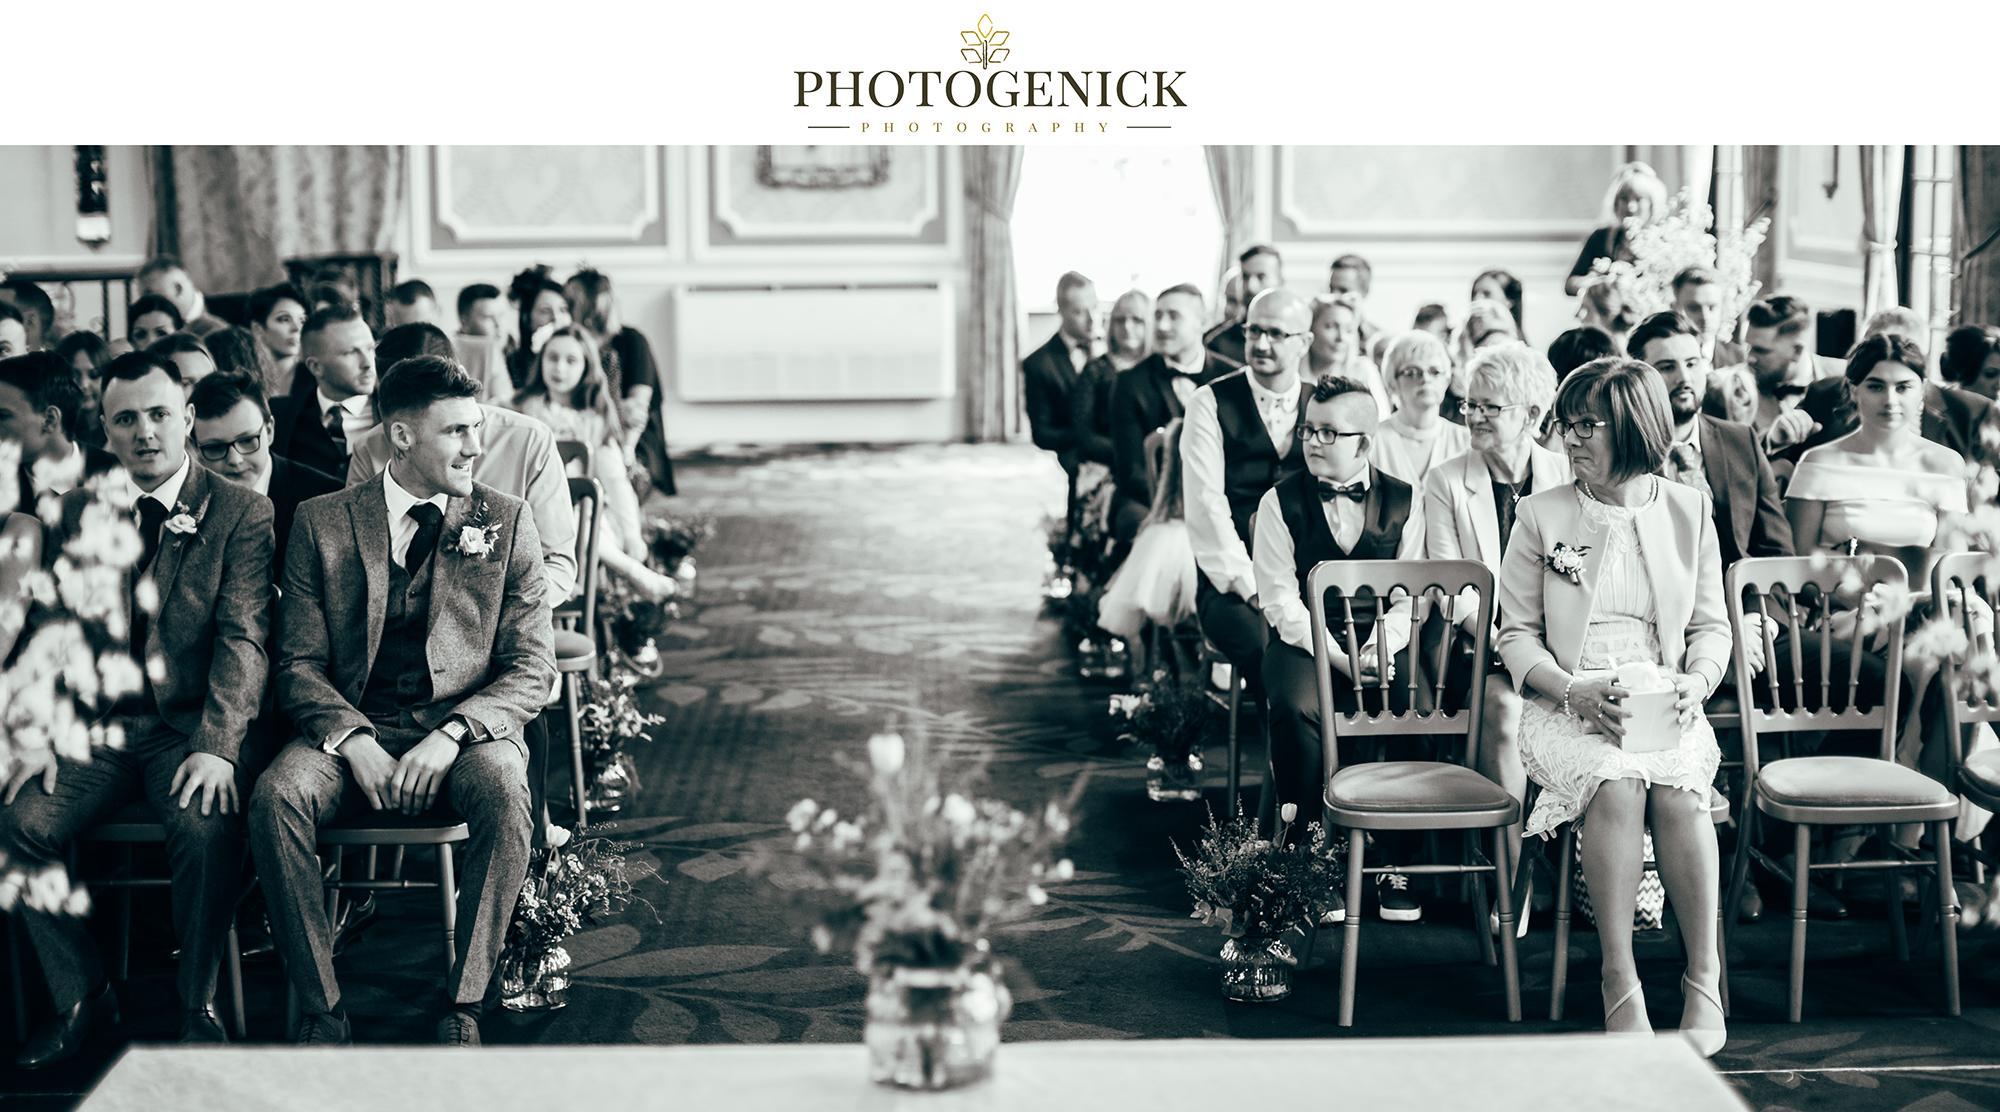 wedding photographers in rotherham, Yorkshire.